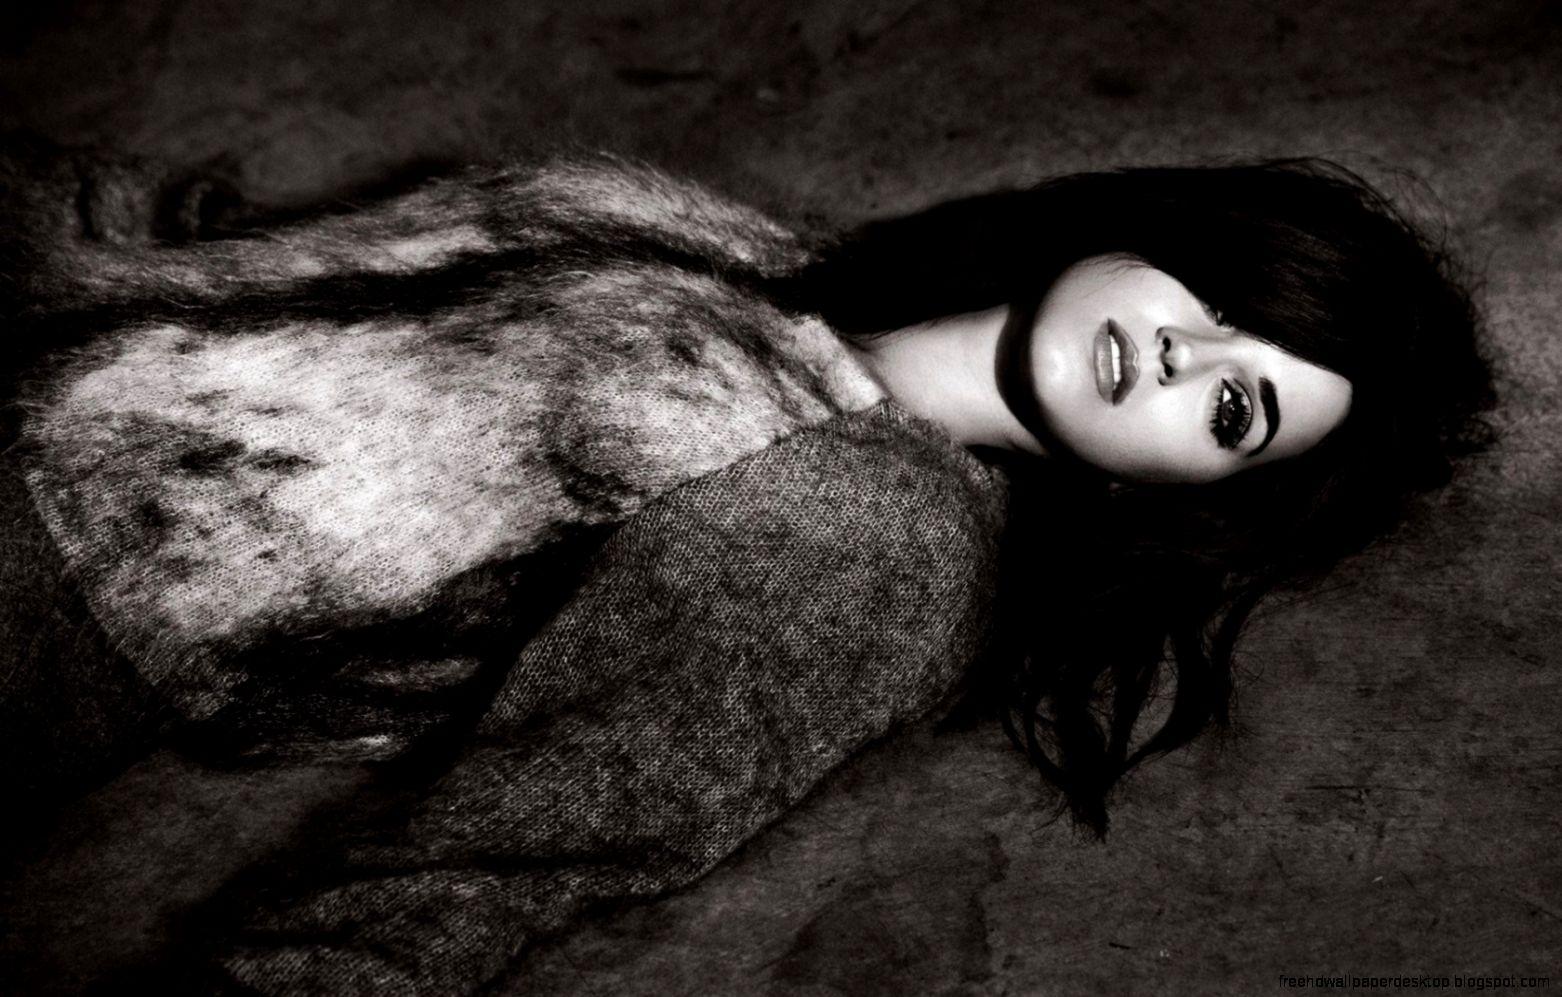 Katy Perry Singer Actress Girl 7012875